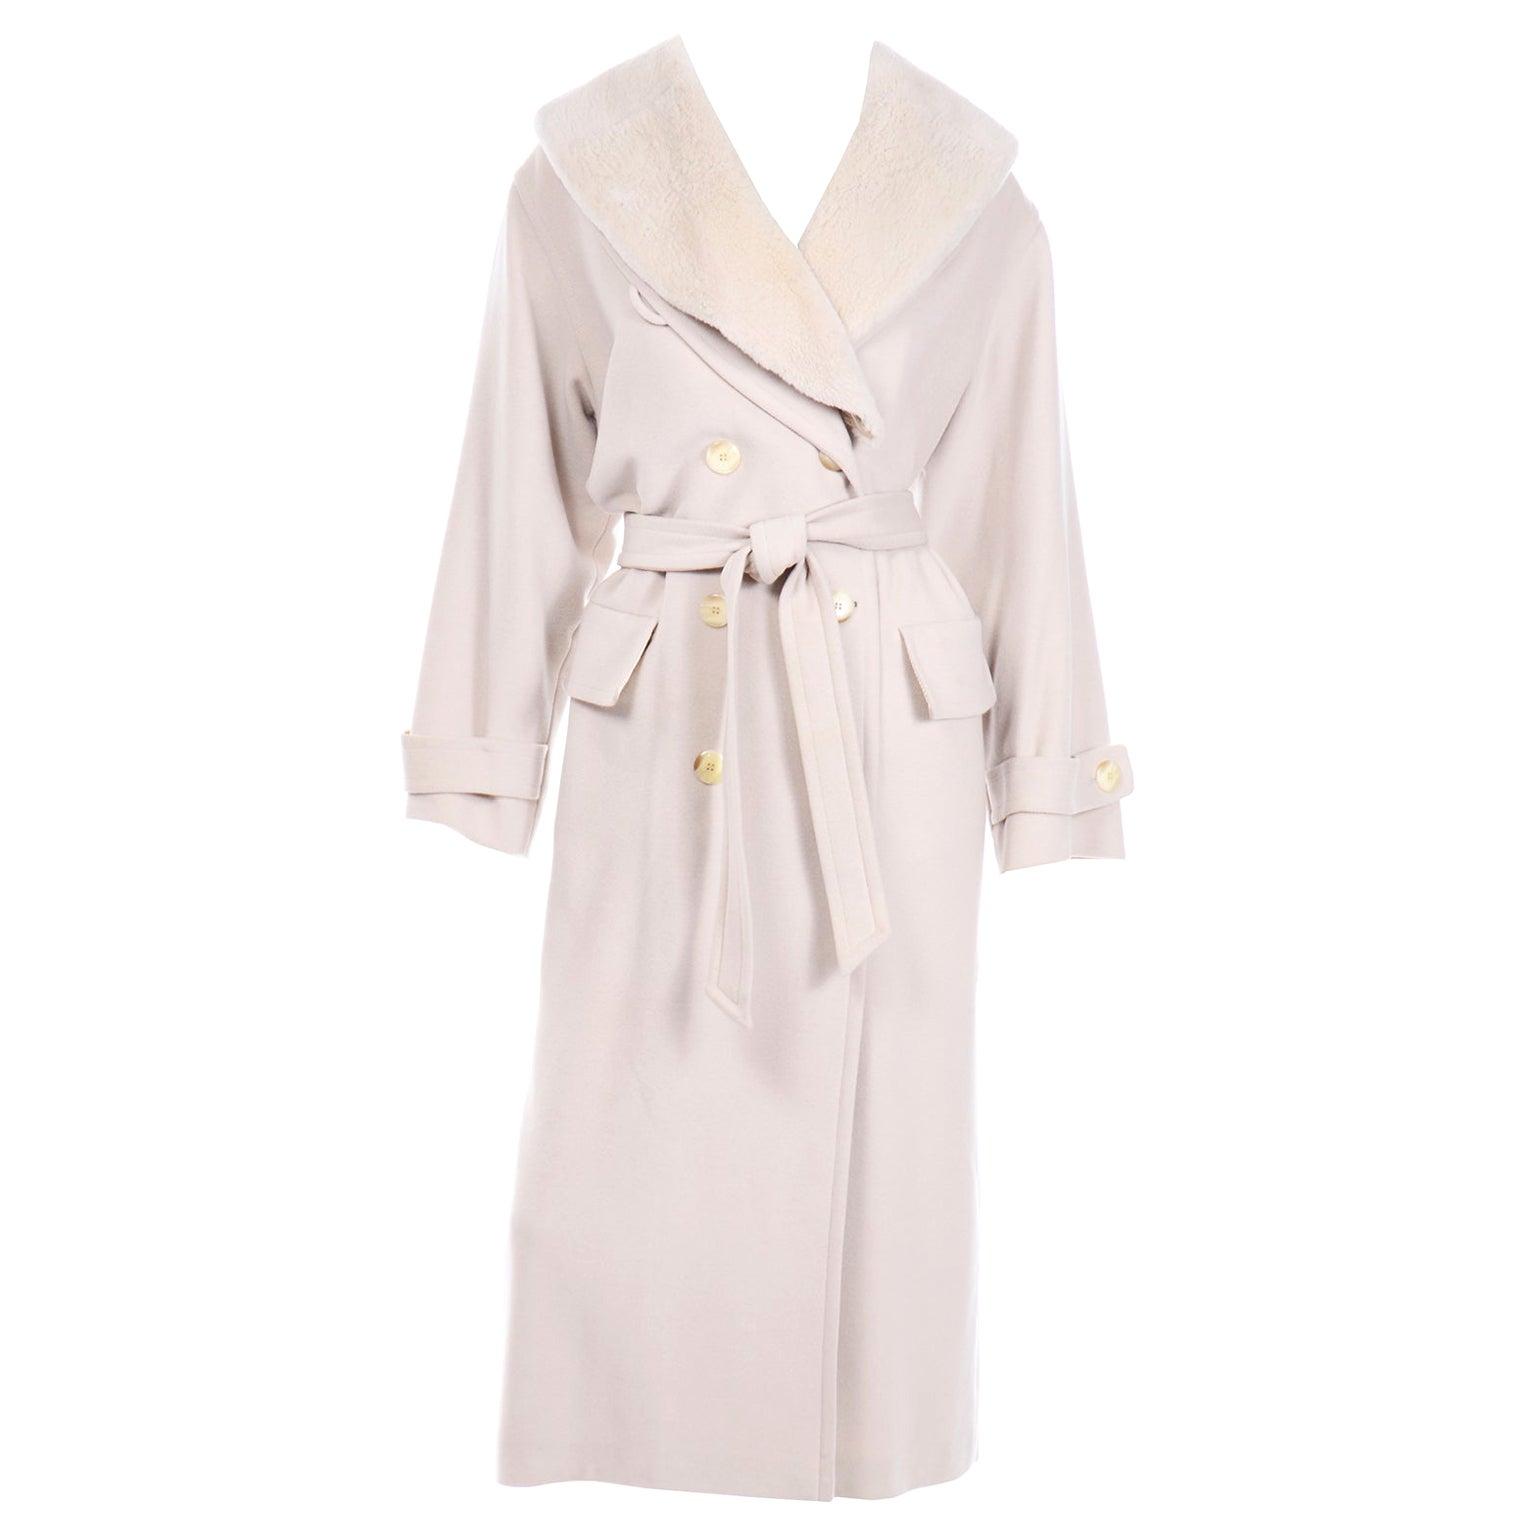 1980s Vintage Louis Feraud Cream Cashmere Wool Angora Coat with Belt